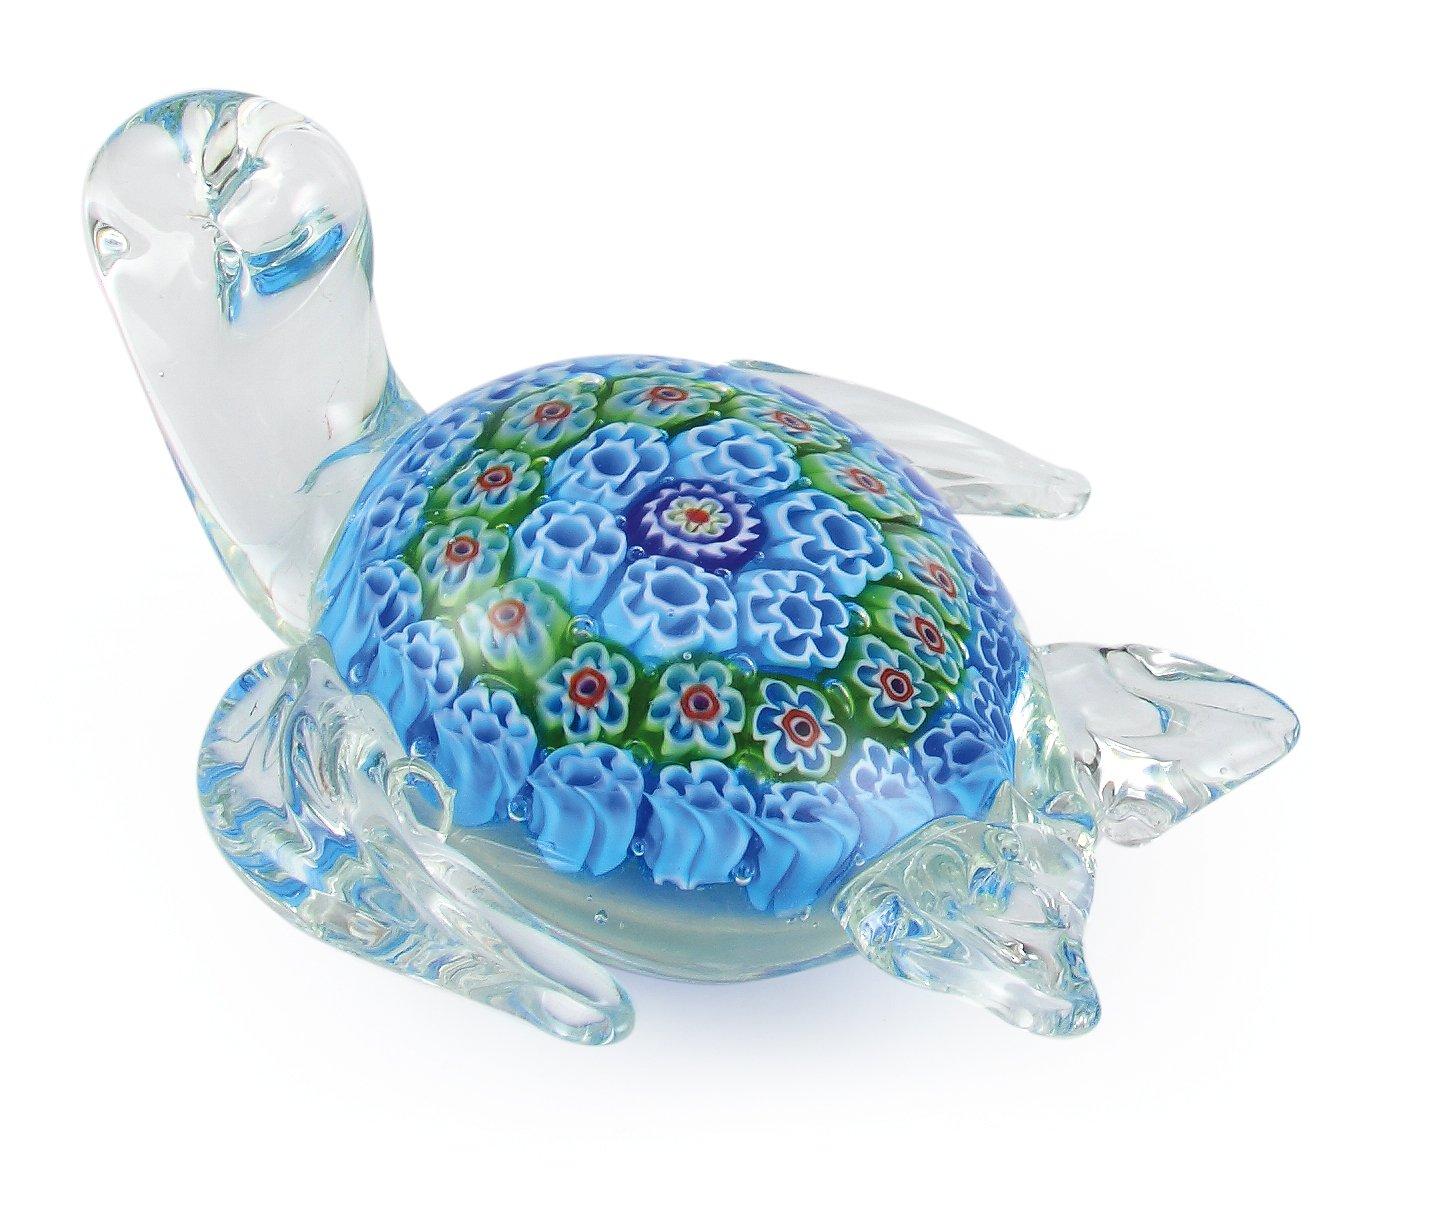 Millefiori Art Glass Turtle Figurine Paperweight by Global Village